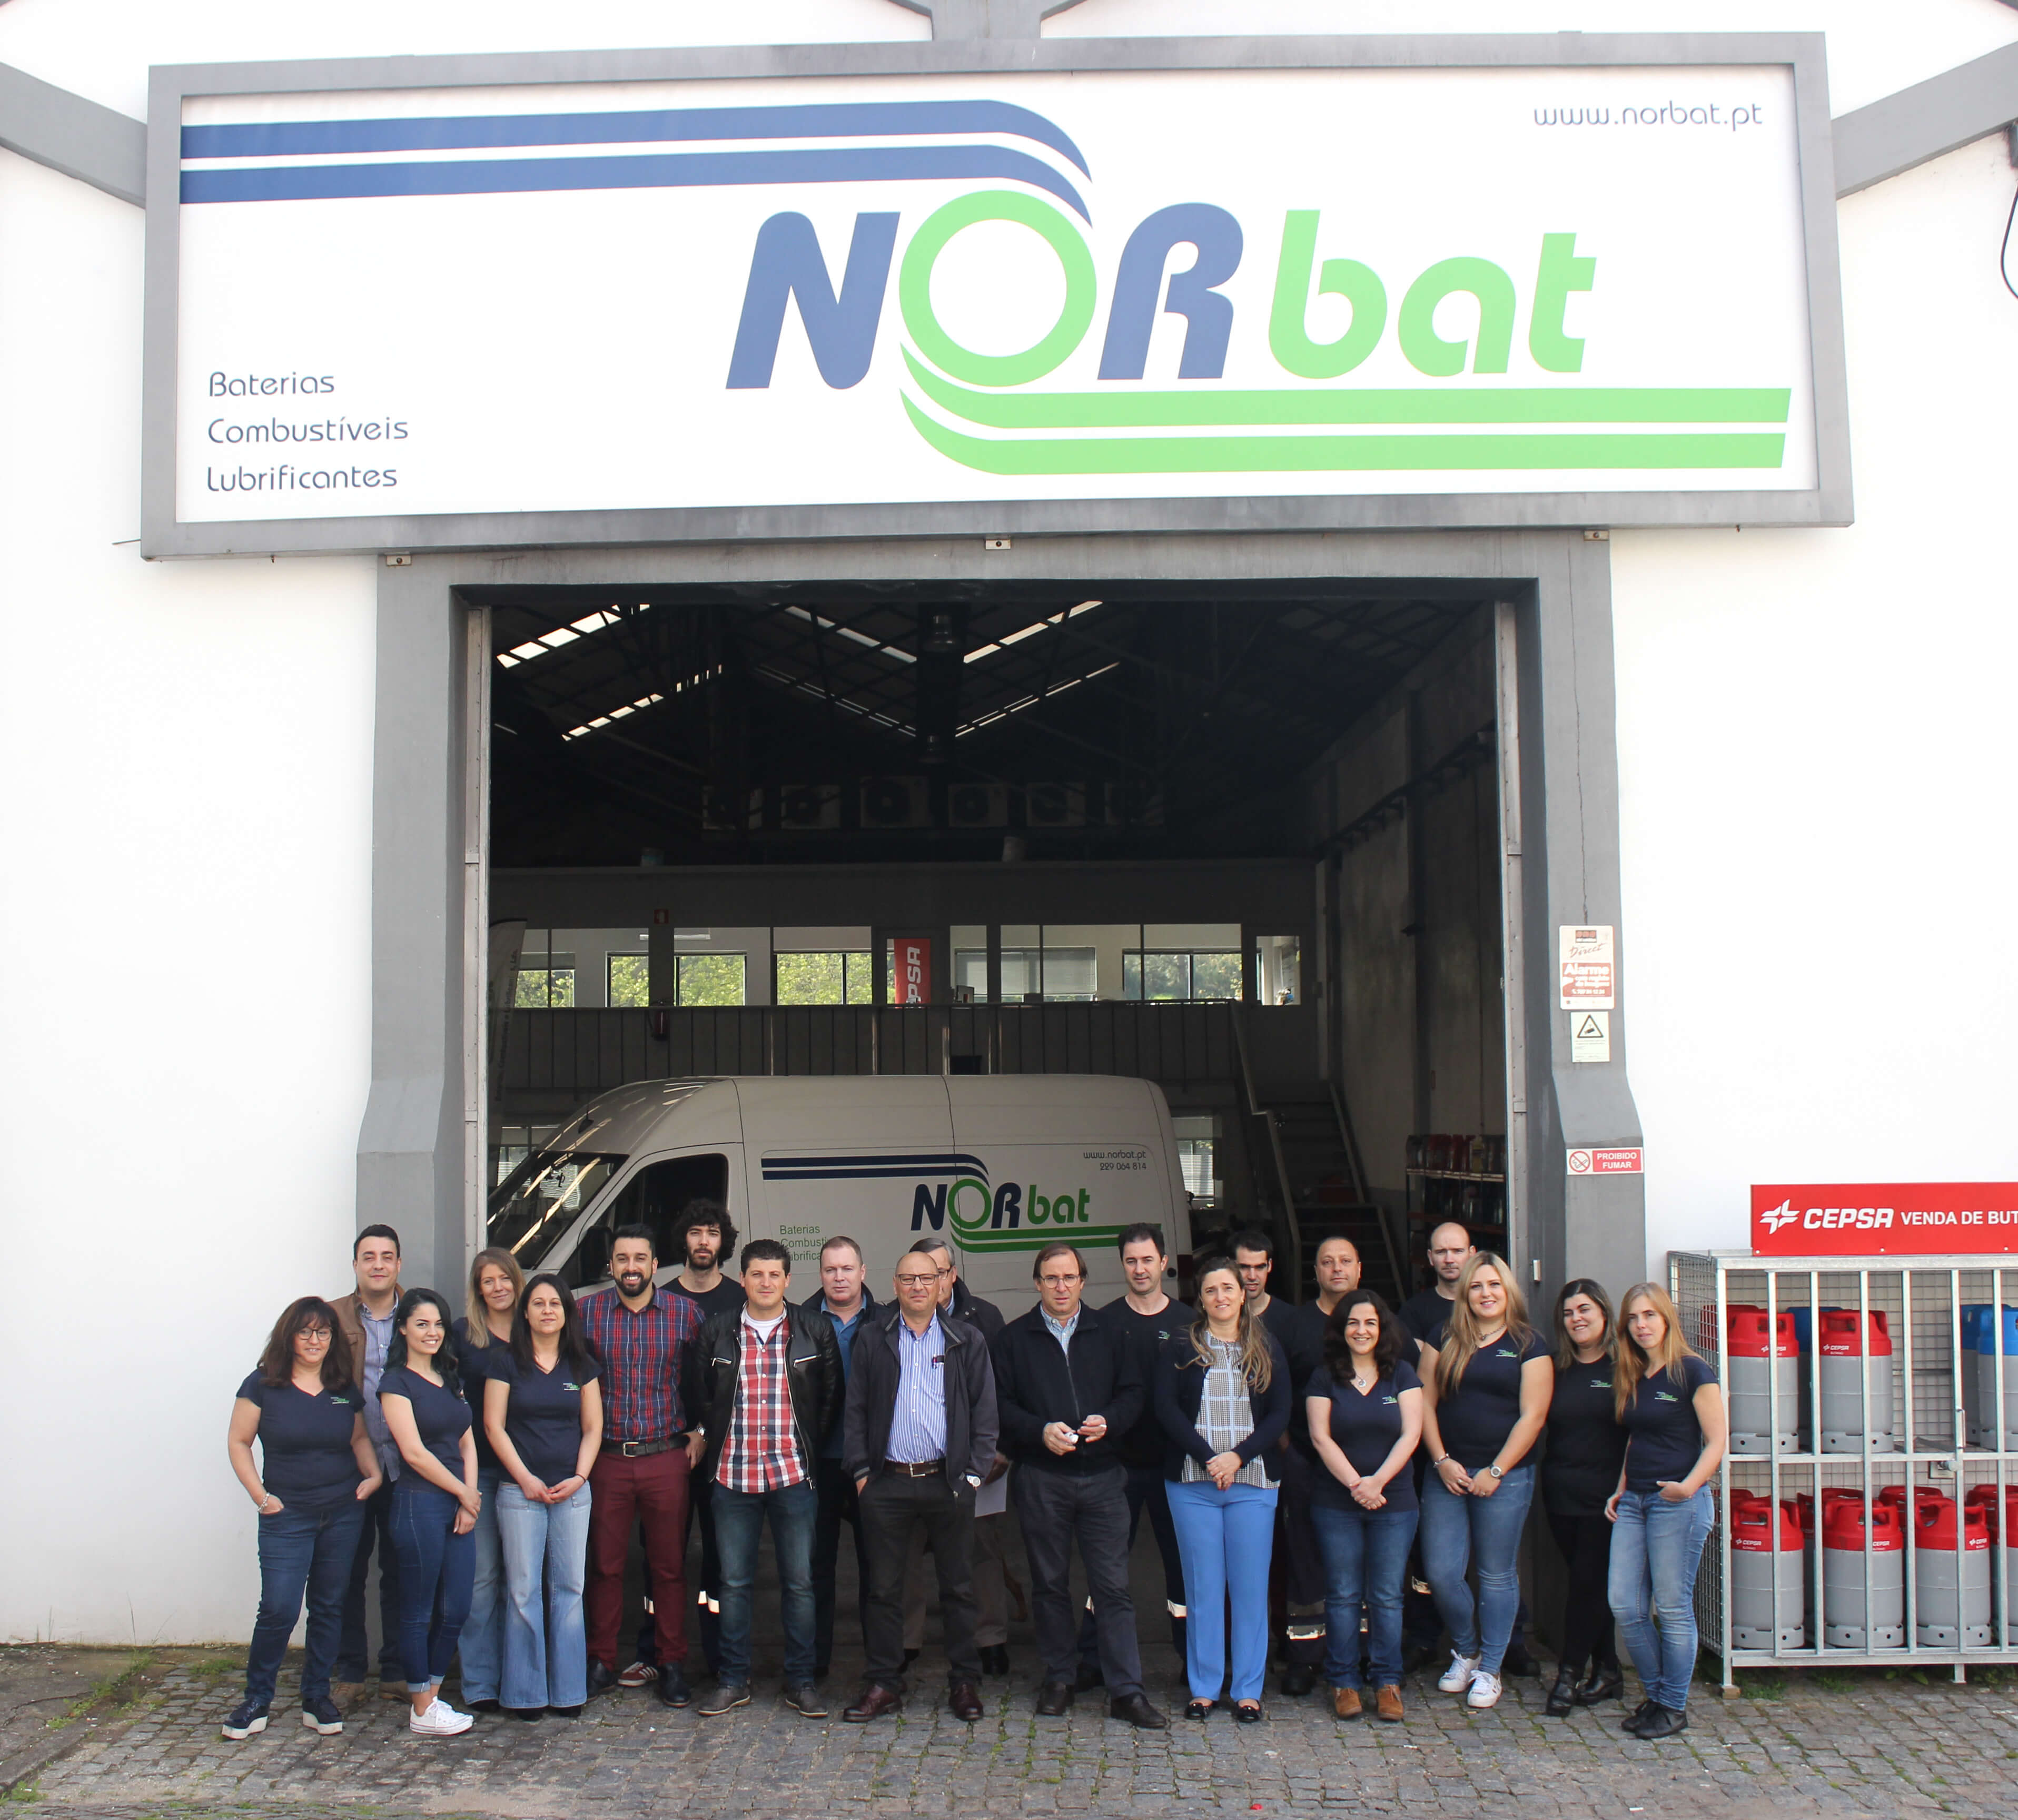 equipa grupo norbat